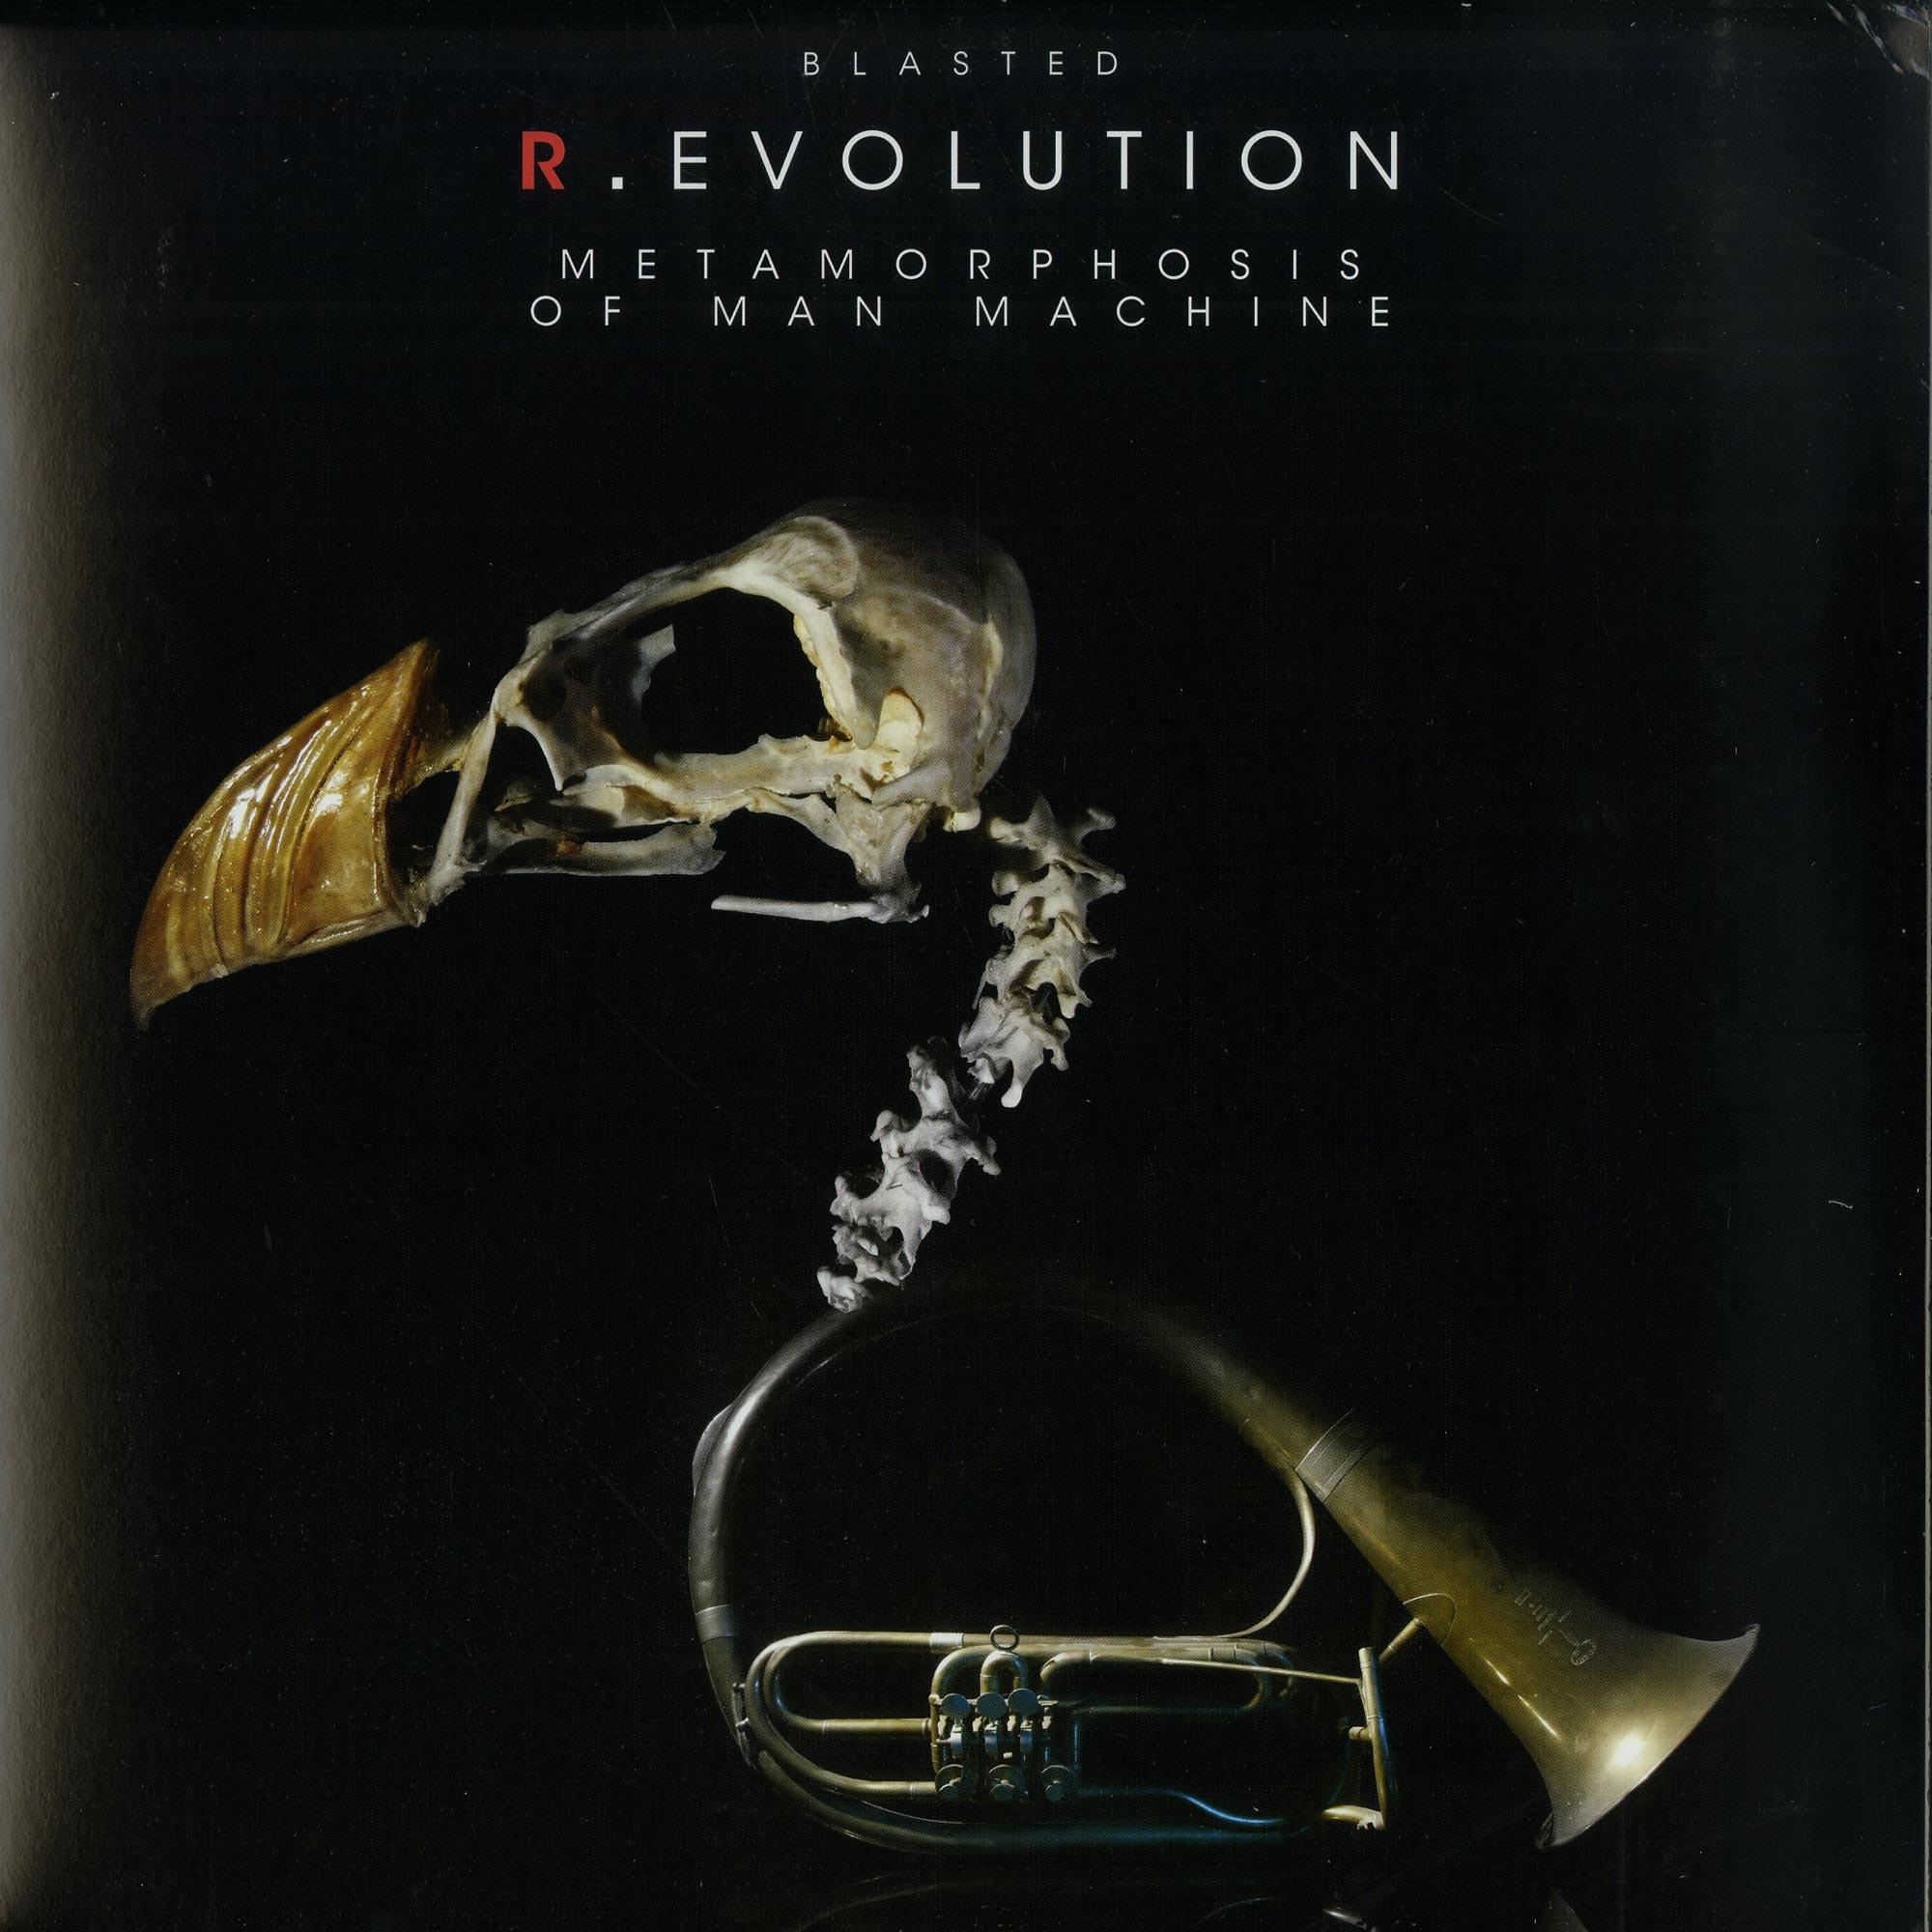 Blasted - R.EVOLUTION